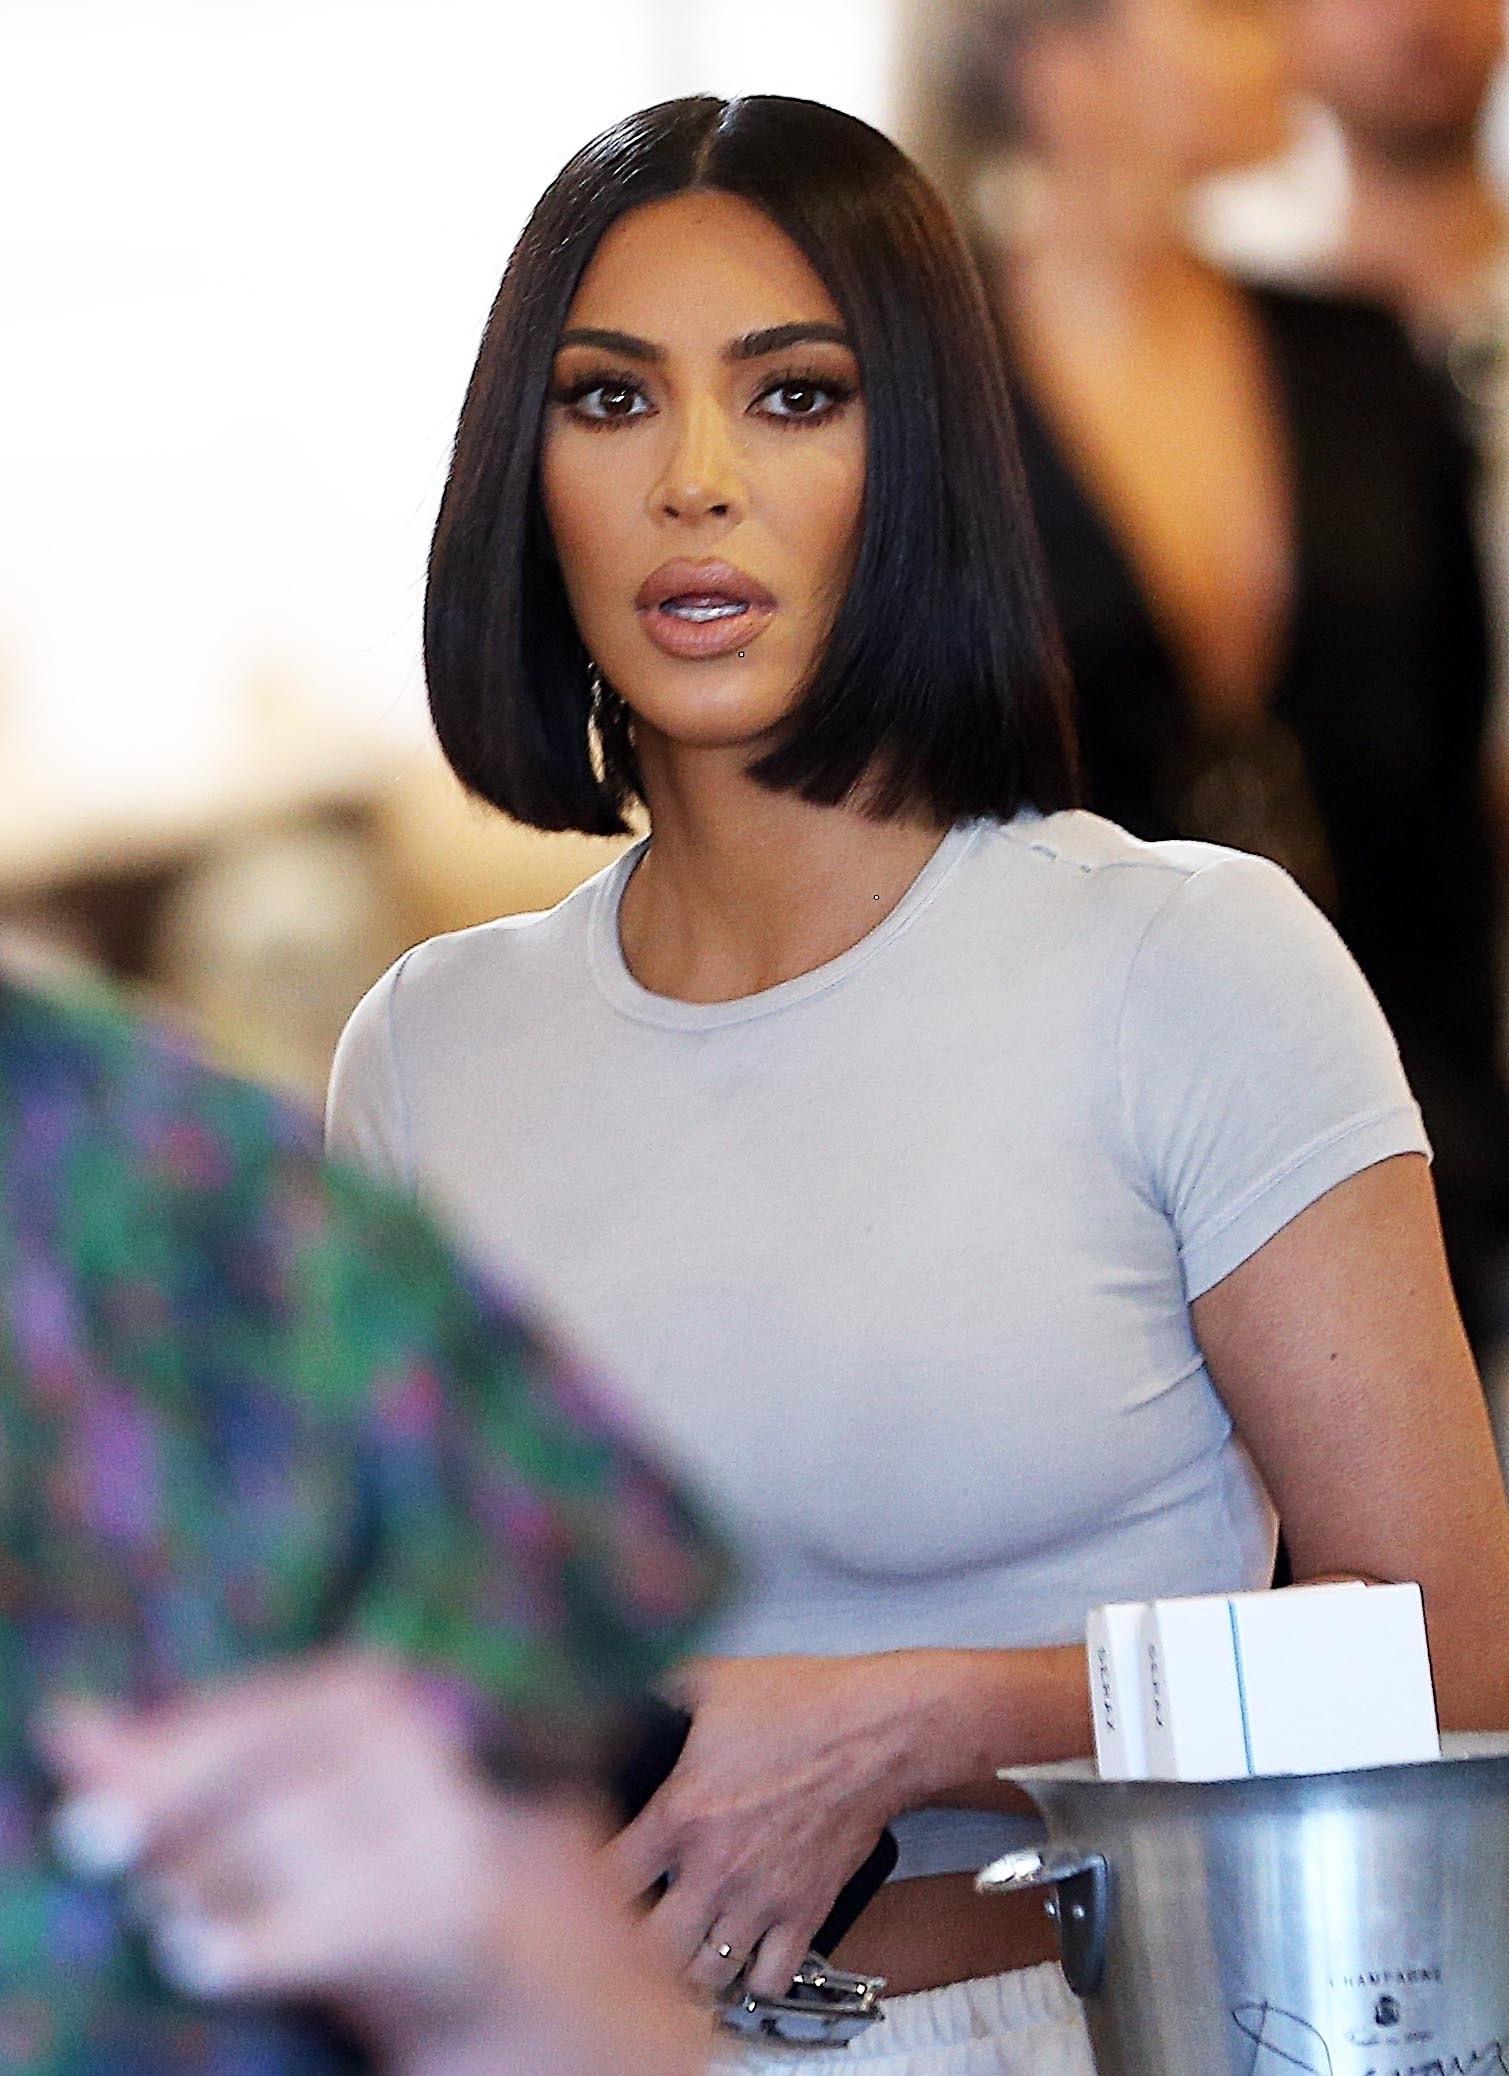 *EXCLUSIVE* Kim and Khloe Kardashian depart after lunch with Scott Disick for KUWTK Kim Kardashian